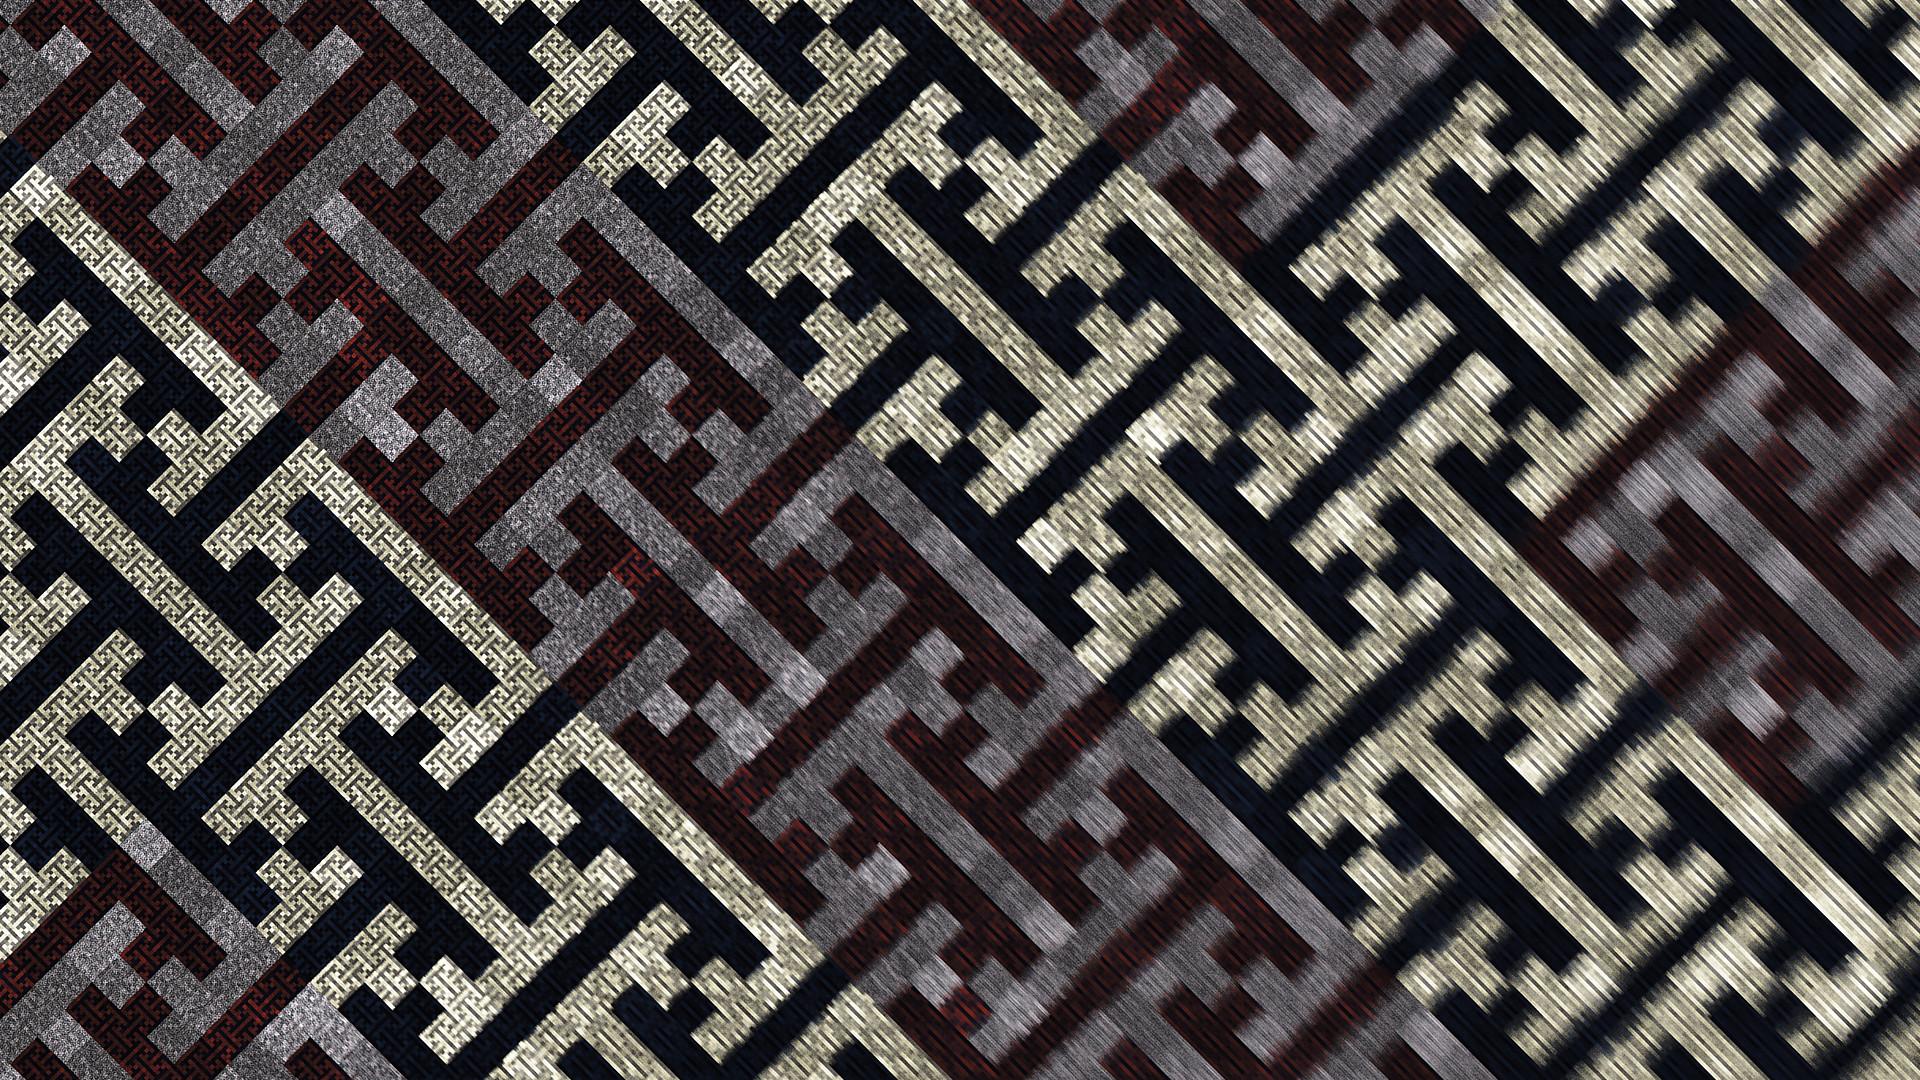 FRAMEofMIND Swastika Fractal (wallpaper)